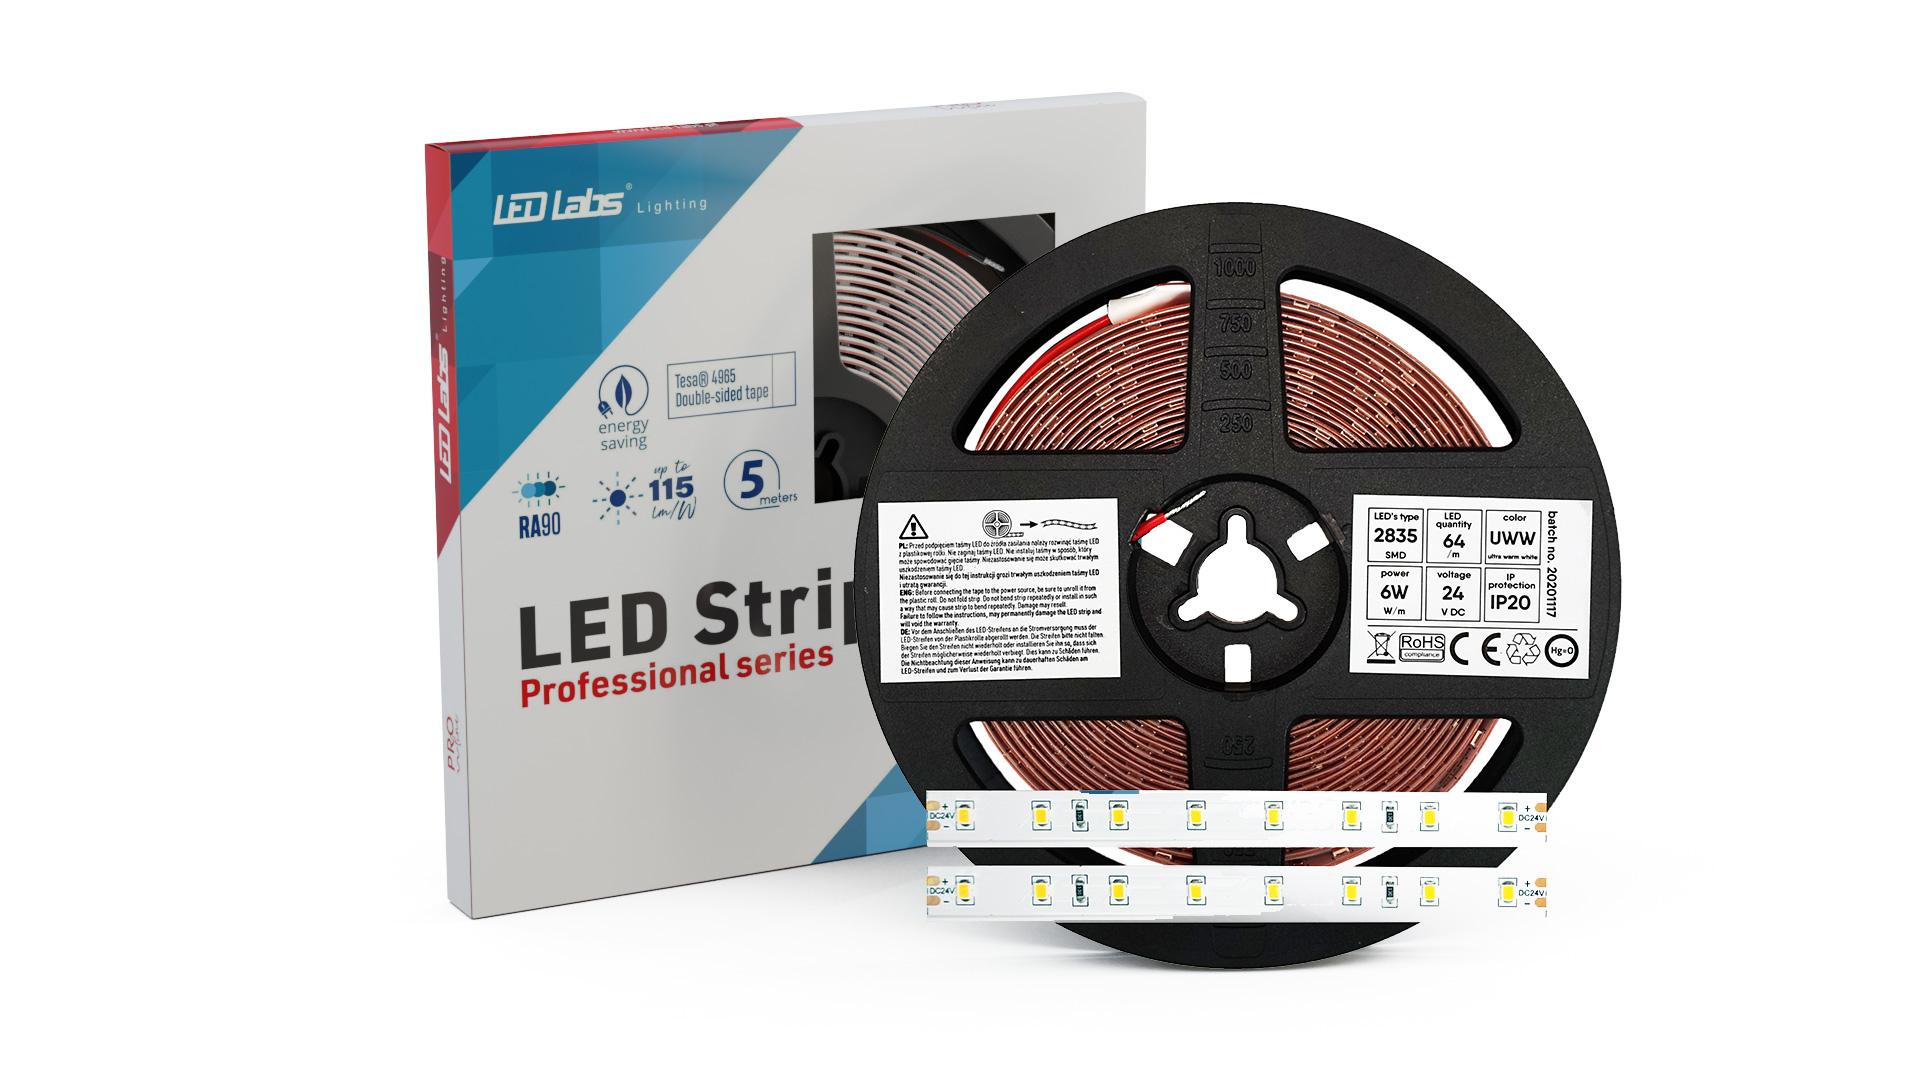 LED Strip PRO 5Y 24V 320 LED 2835 SMD 6W 3000K RA90